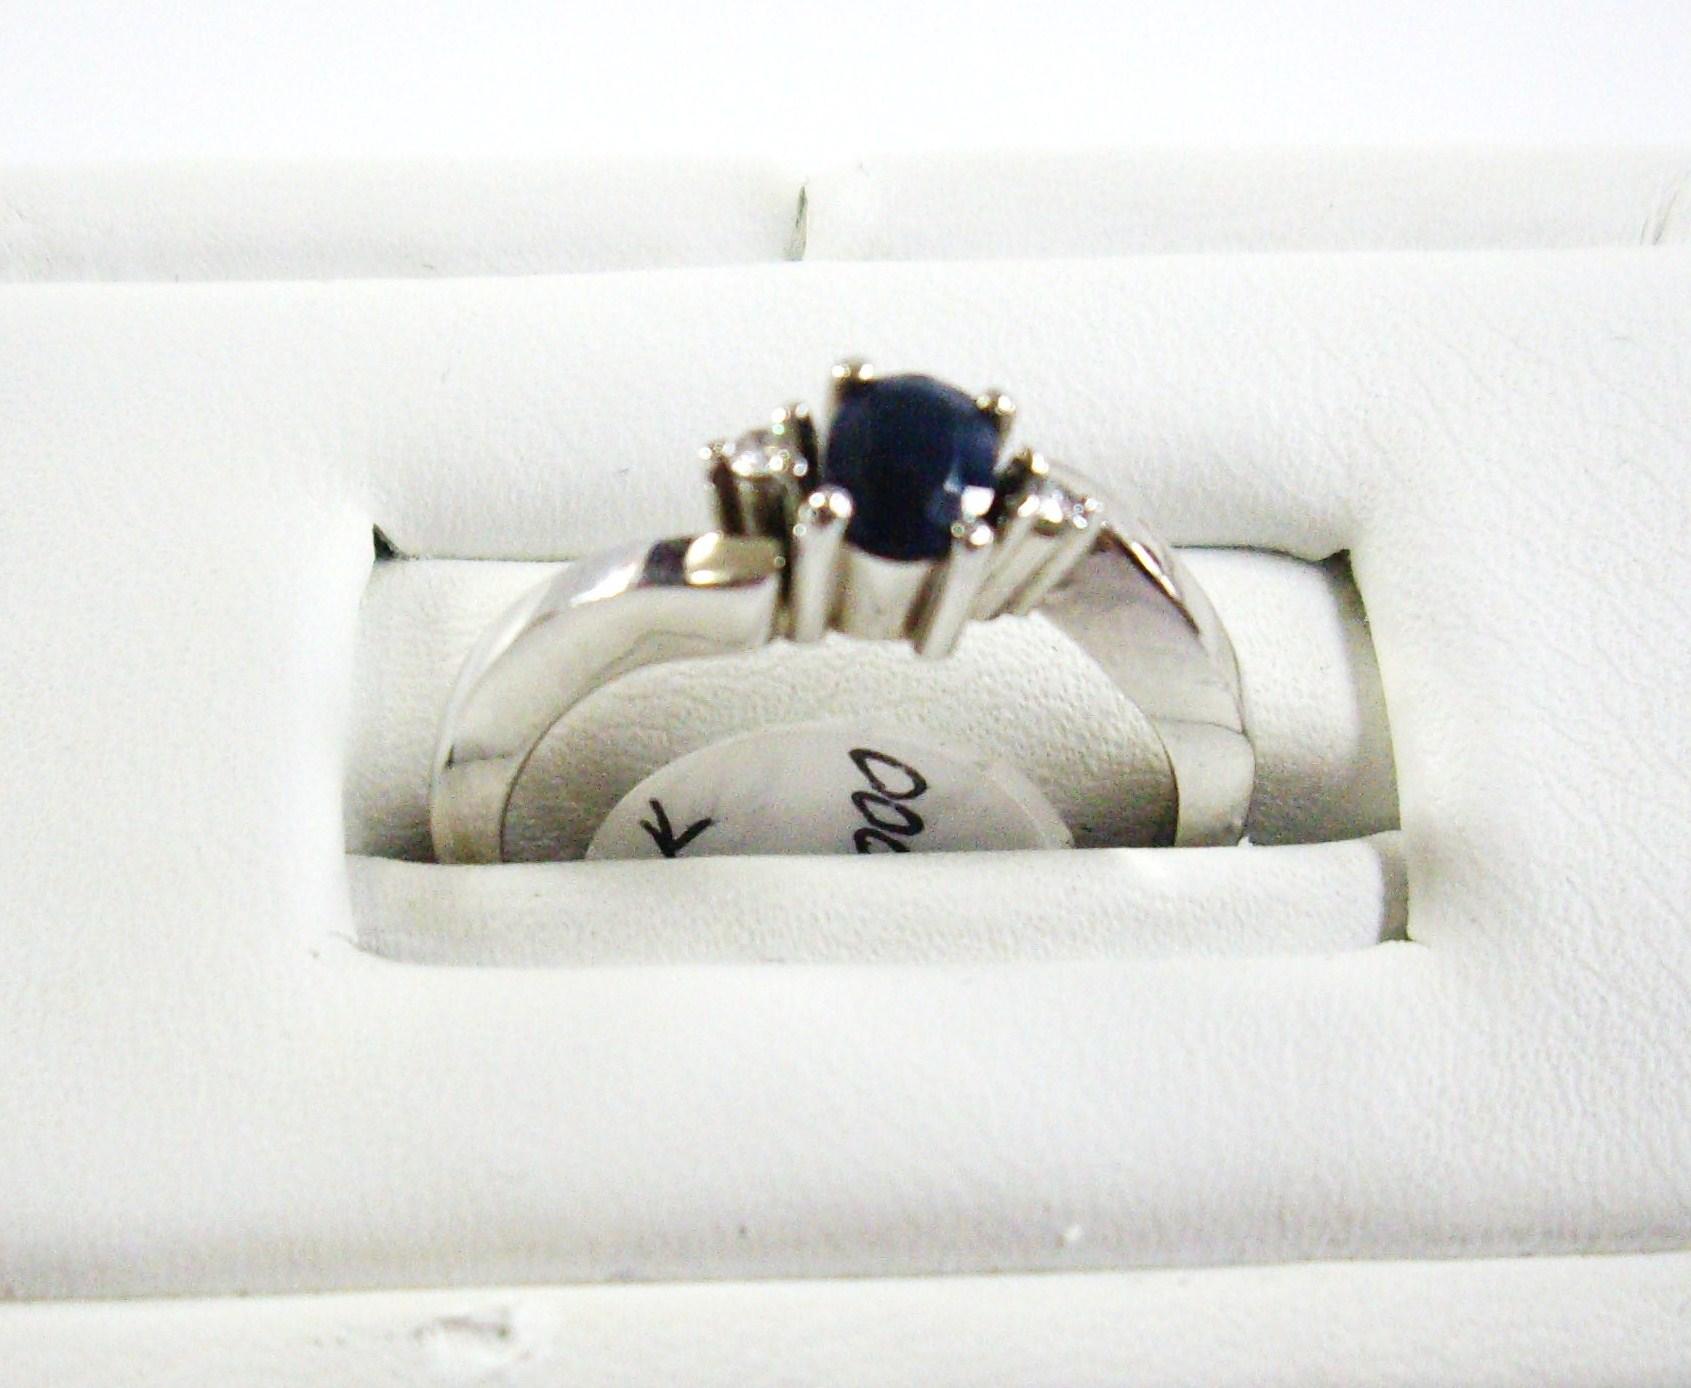 Anillo en oro blanco y safiro - White gold and sapphire ring